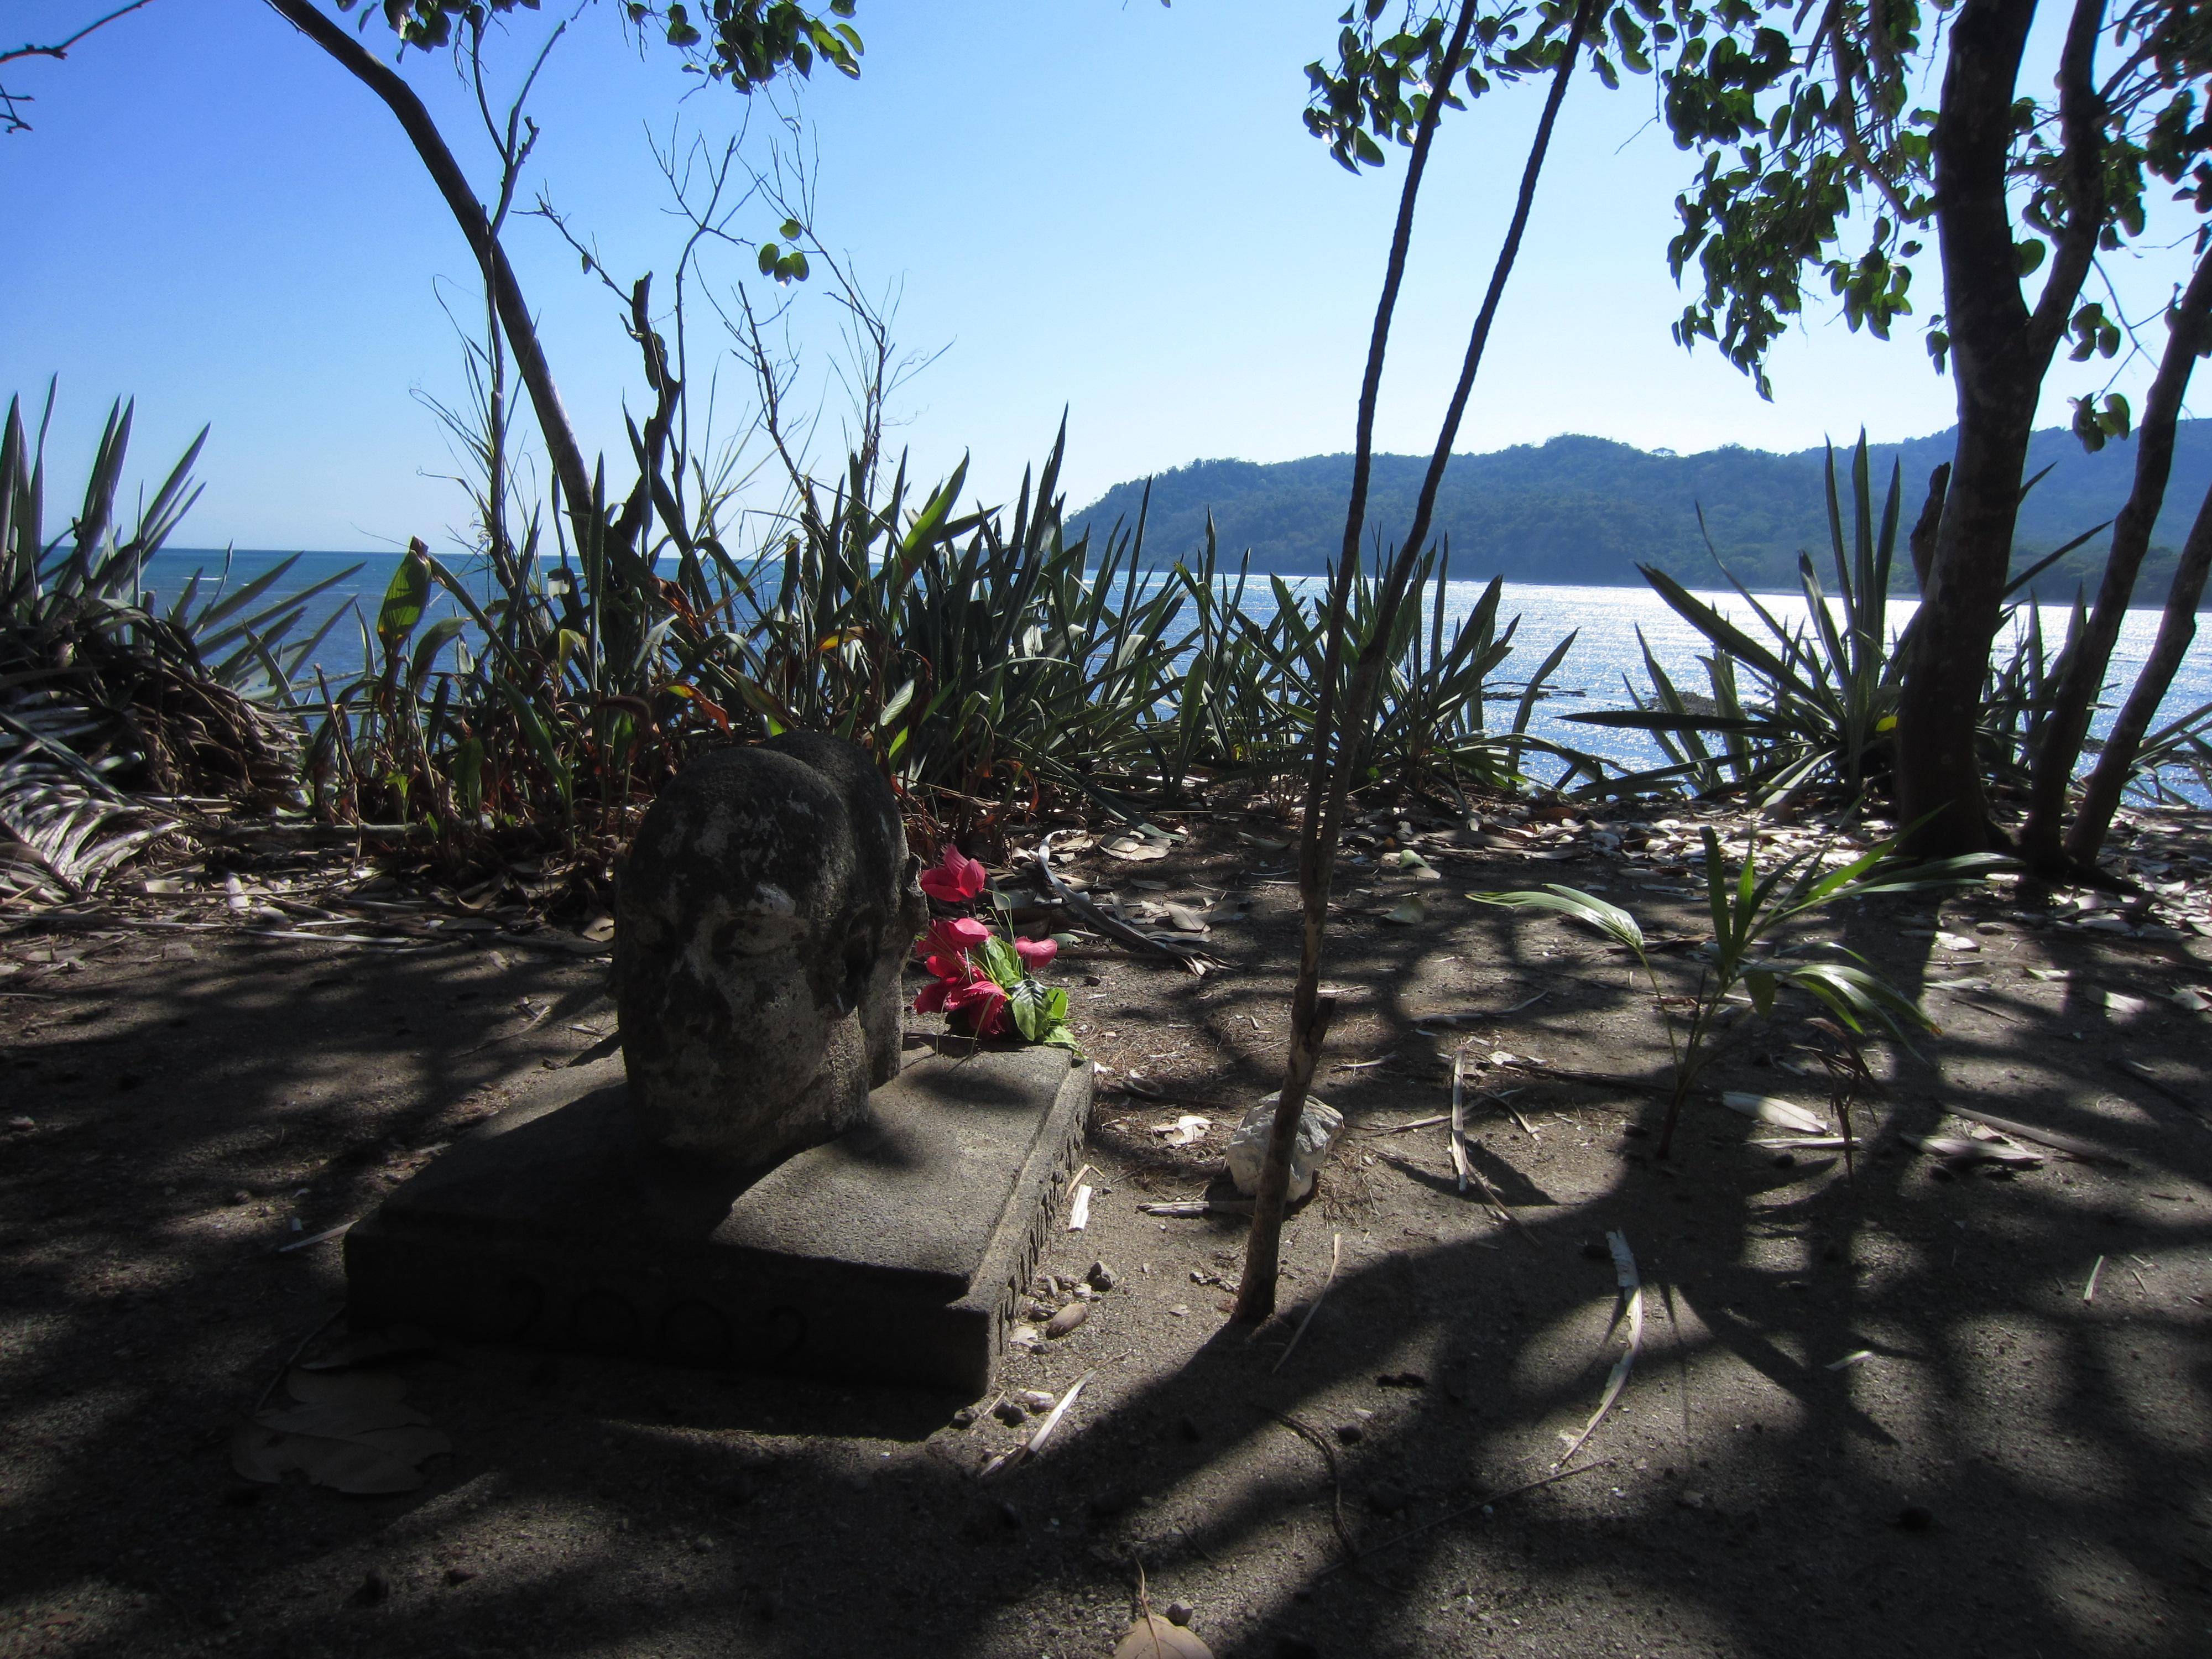 Cemetary 'headstone'